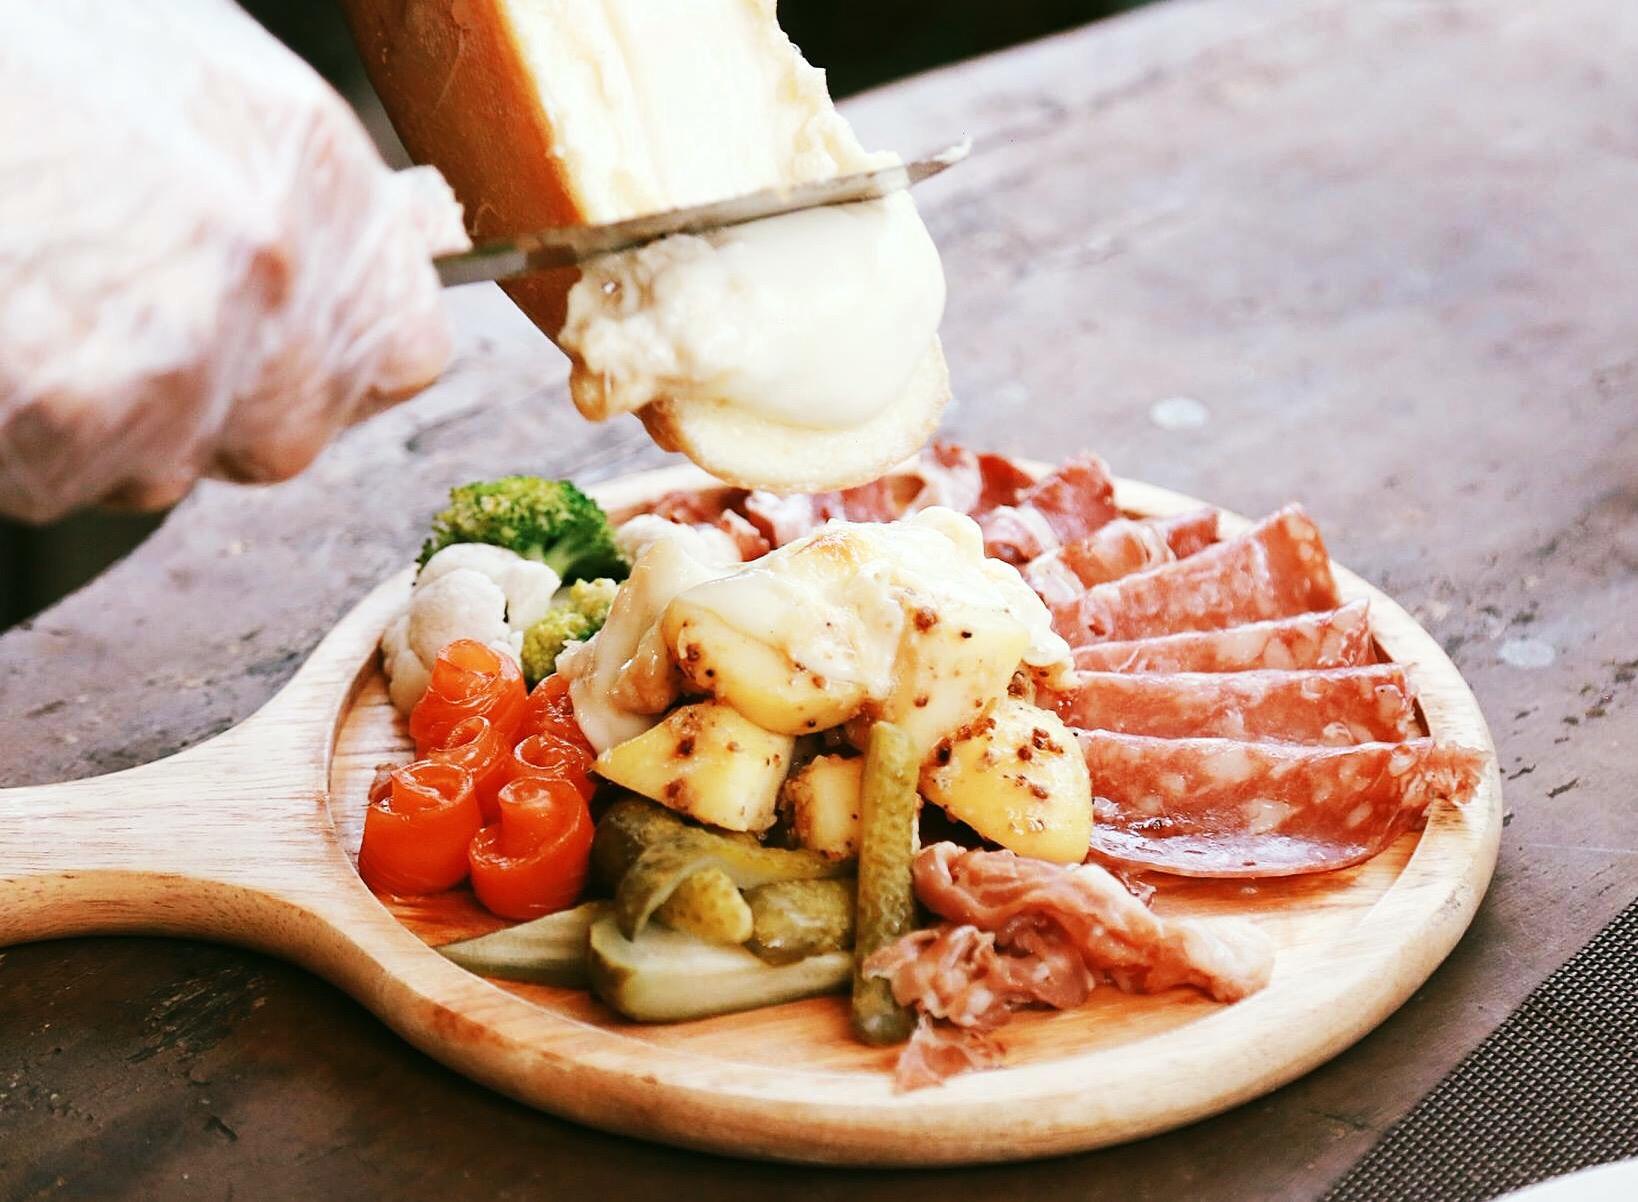 Raclette Cheese - Salmonoid's Signature